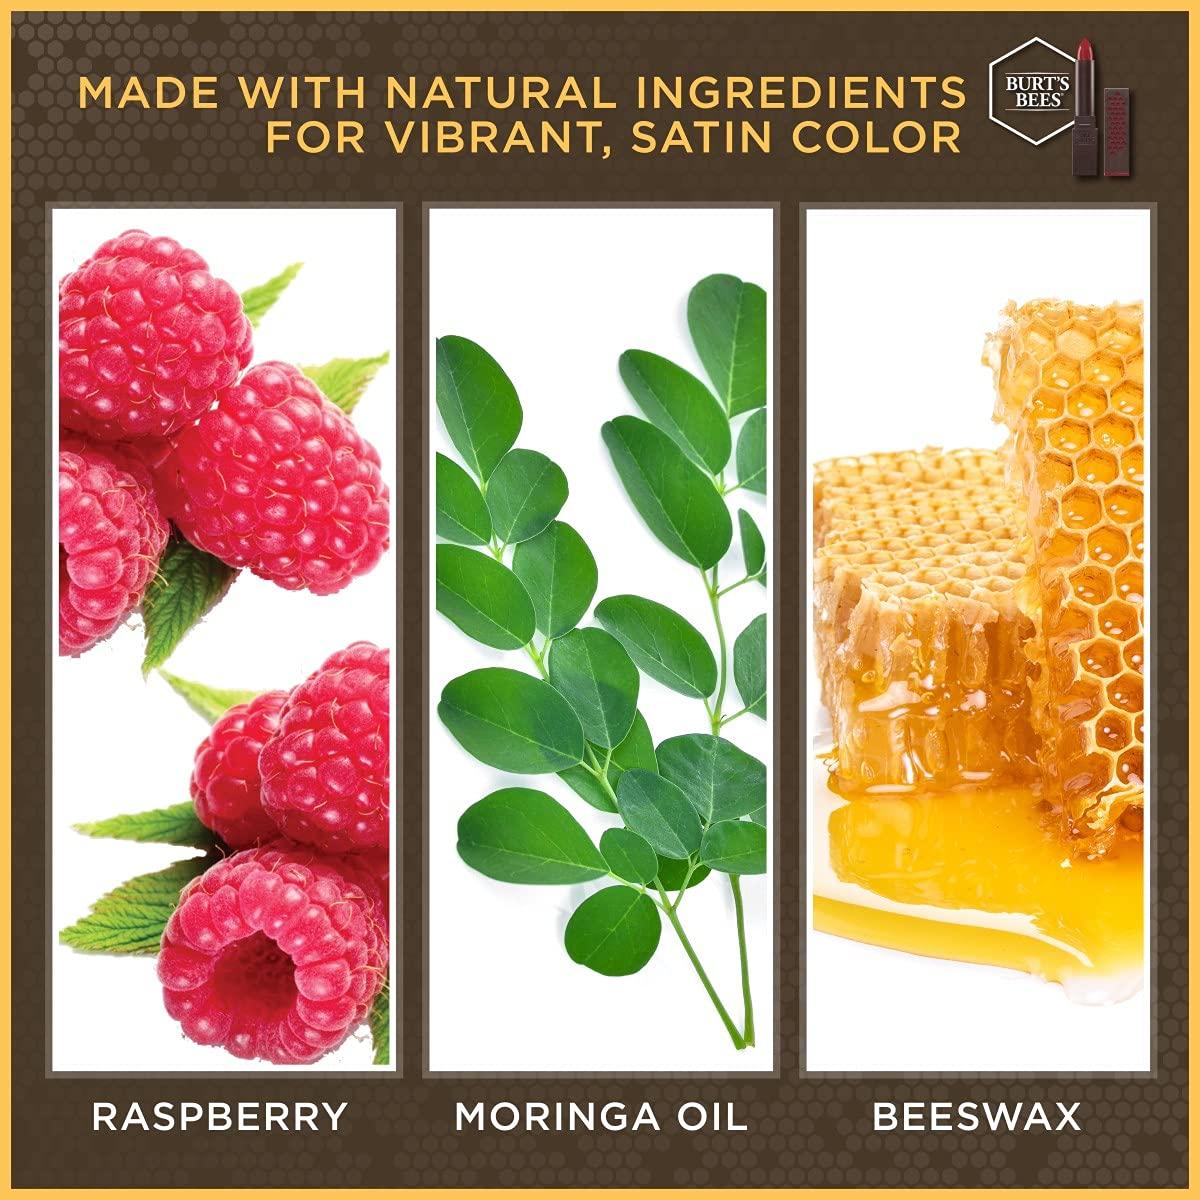 Burt's Bees 100% Natural Moisturizing Lipstick, Russet River, 1 Tube